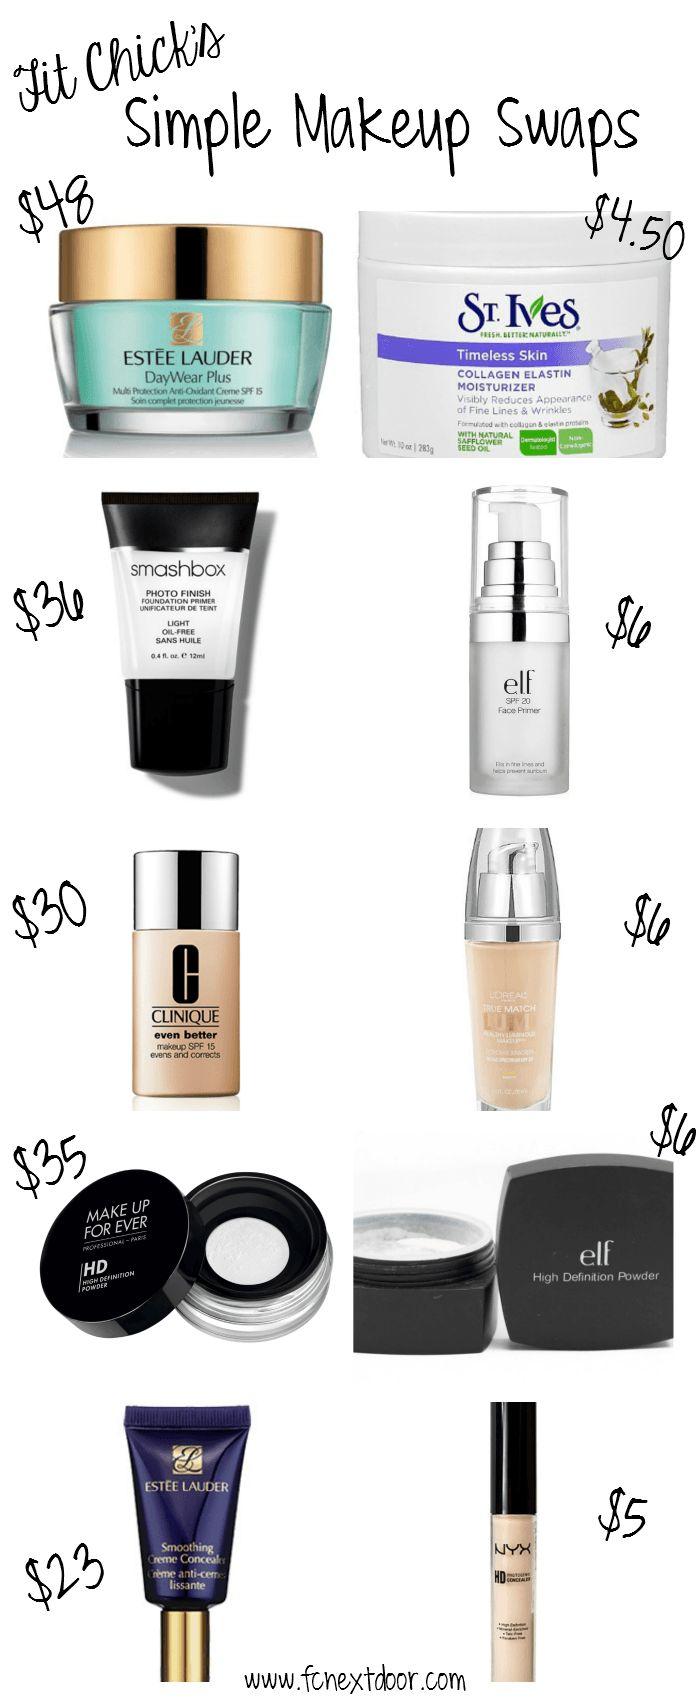 Fit Chick's Simple Makeup Swaps - Vol 1                                                                                                                                                                                 More